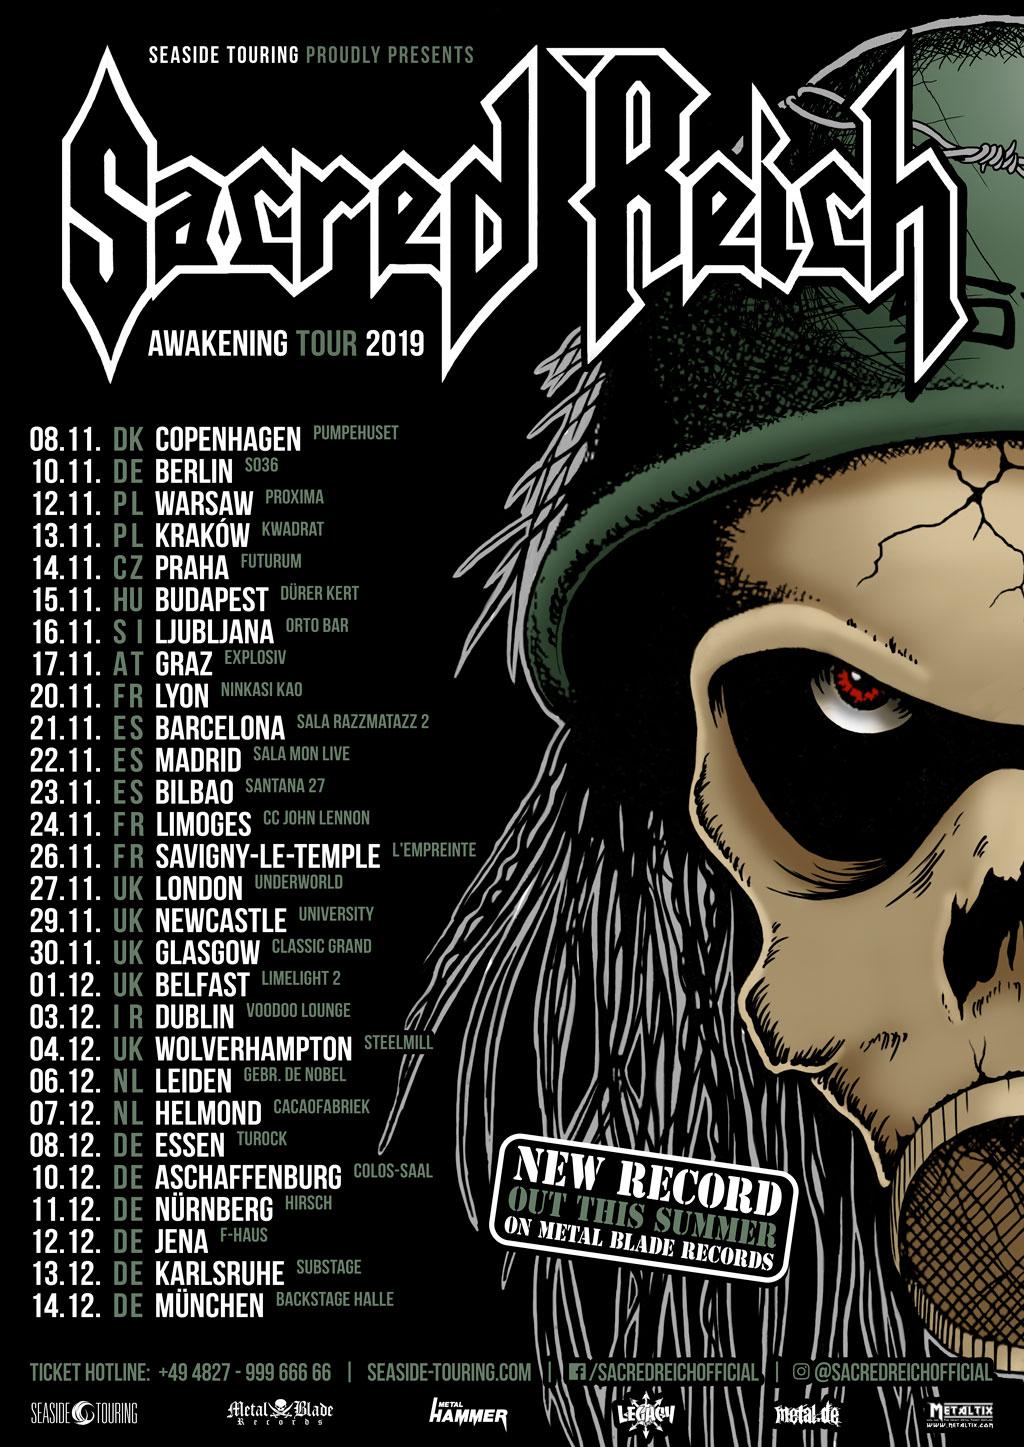 Sacred Reich Awakening Tour 2019